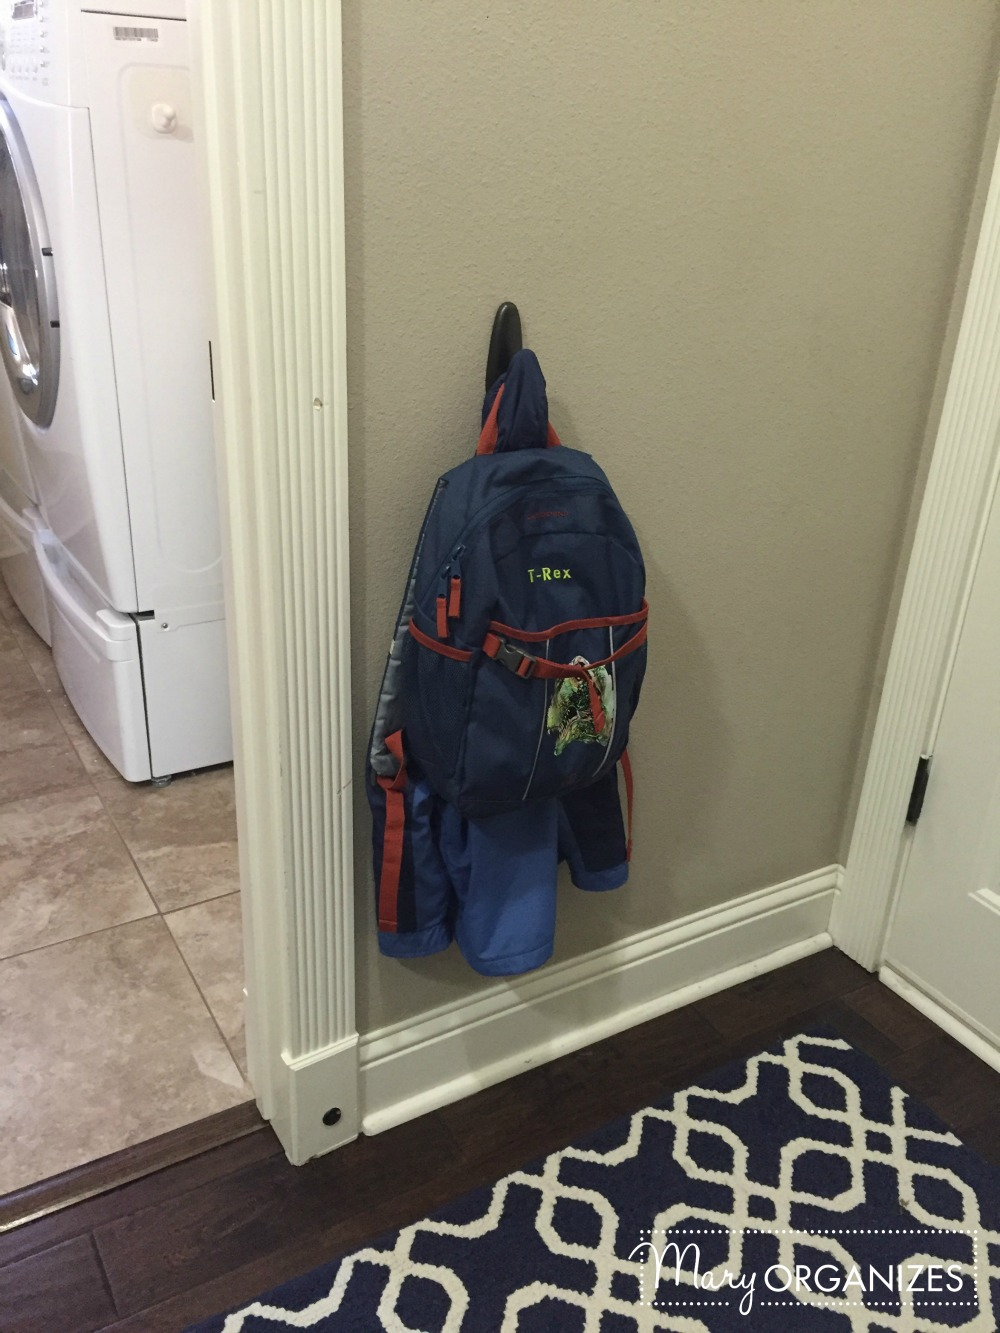 mary organizes - mud area coat hook for boy